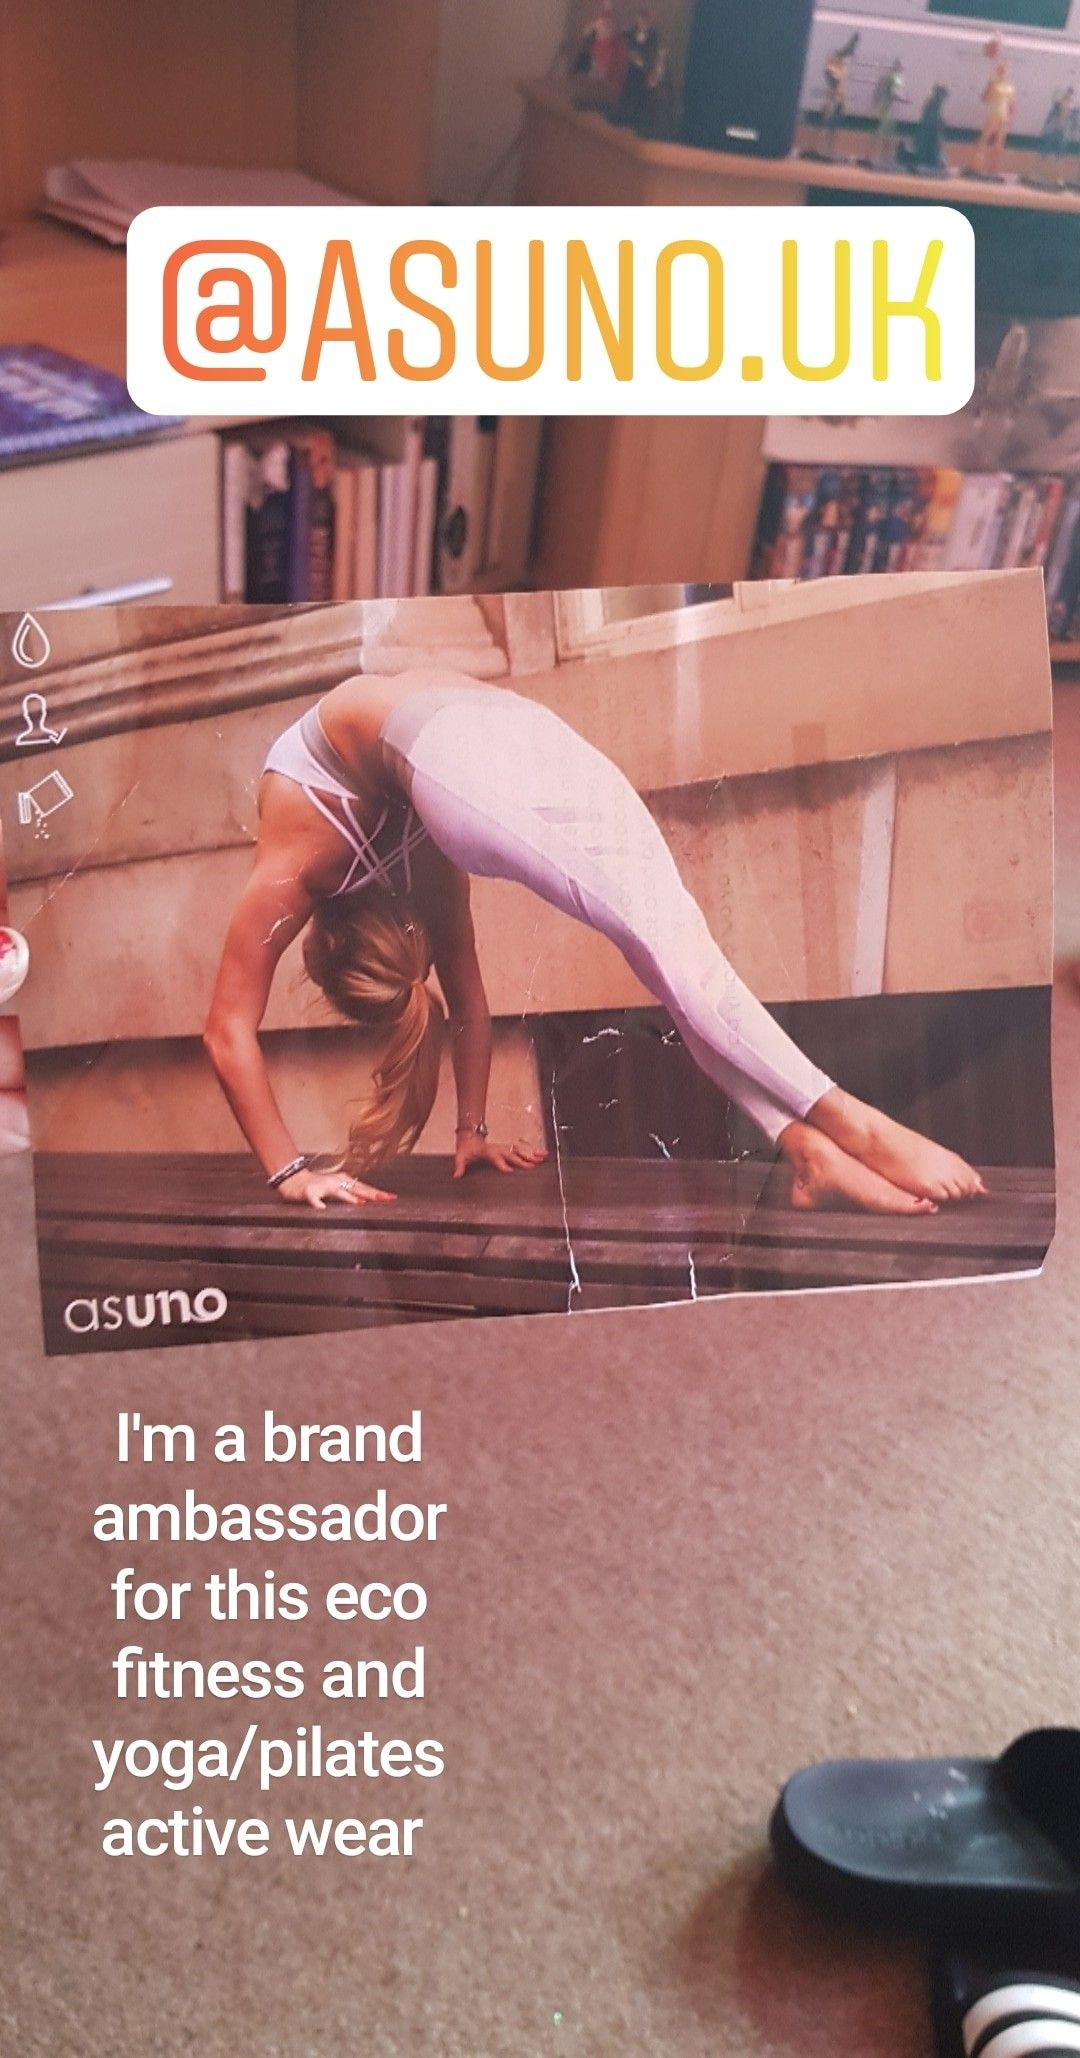 Asuno active wear brand fitness brand ambassador